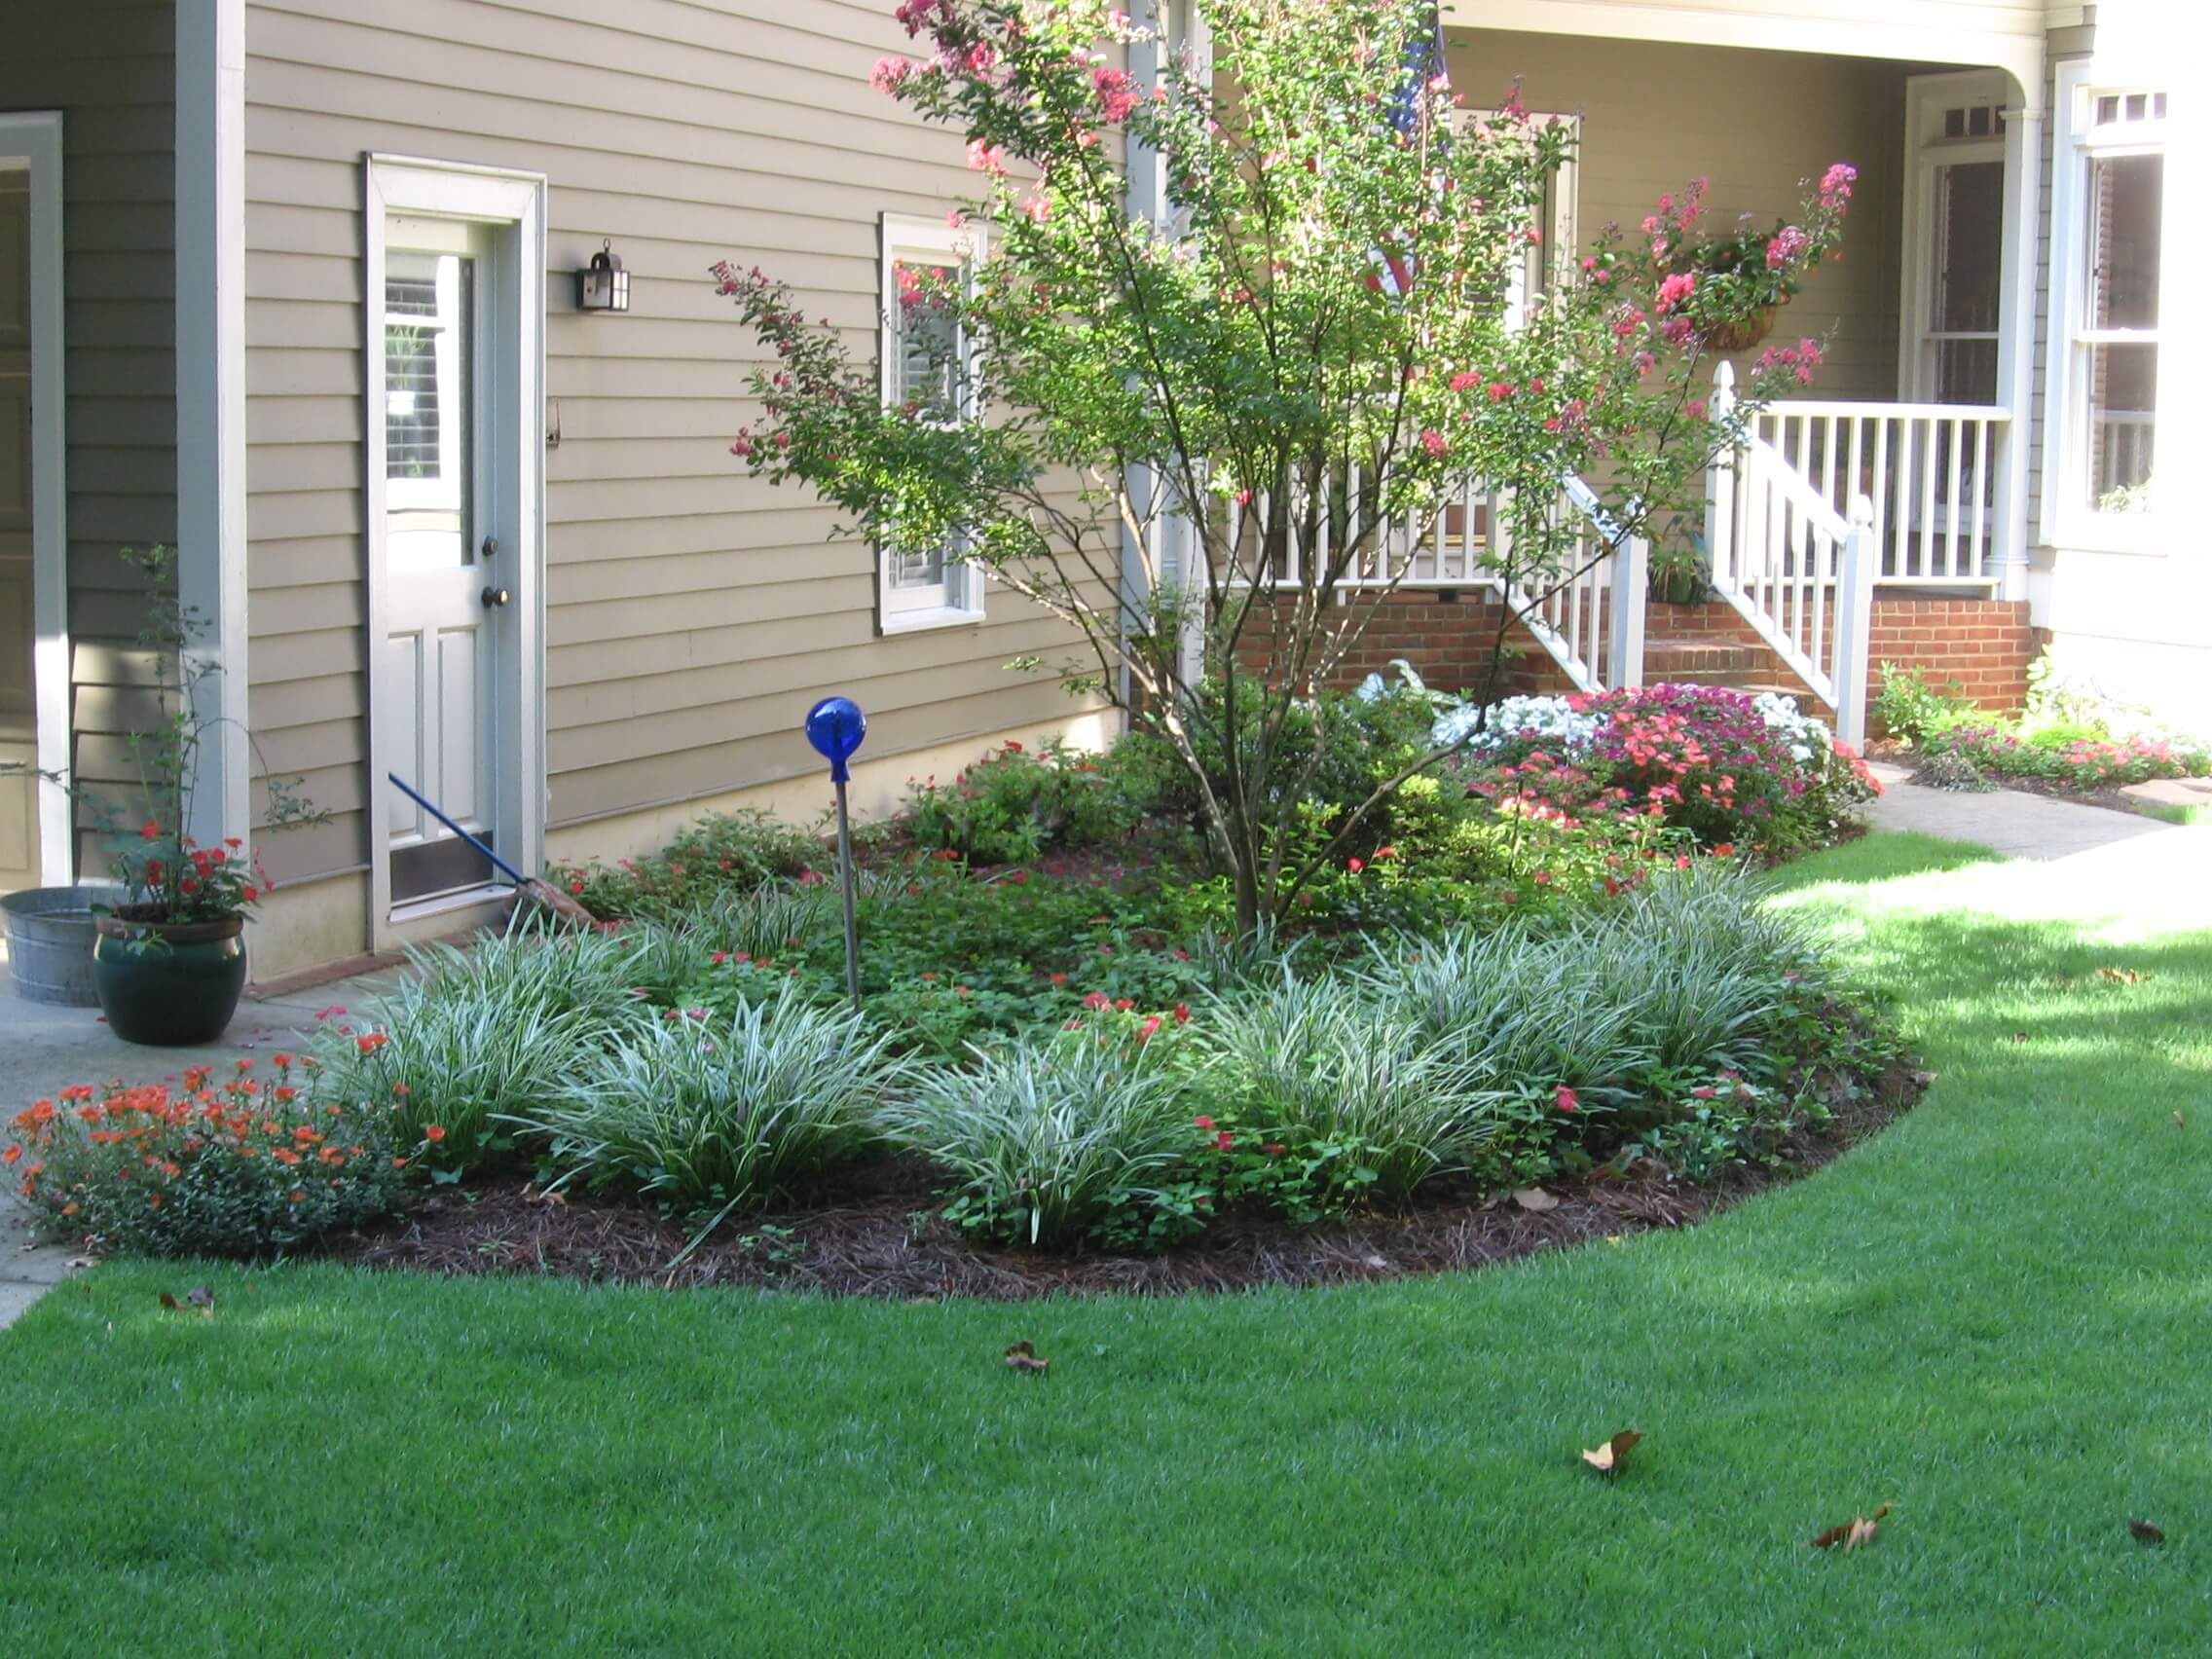 Full Home Amp Landscape Design In Buckhead Metro Atlanta